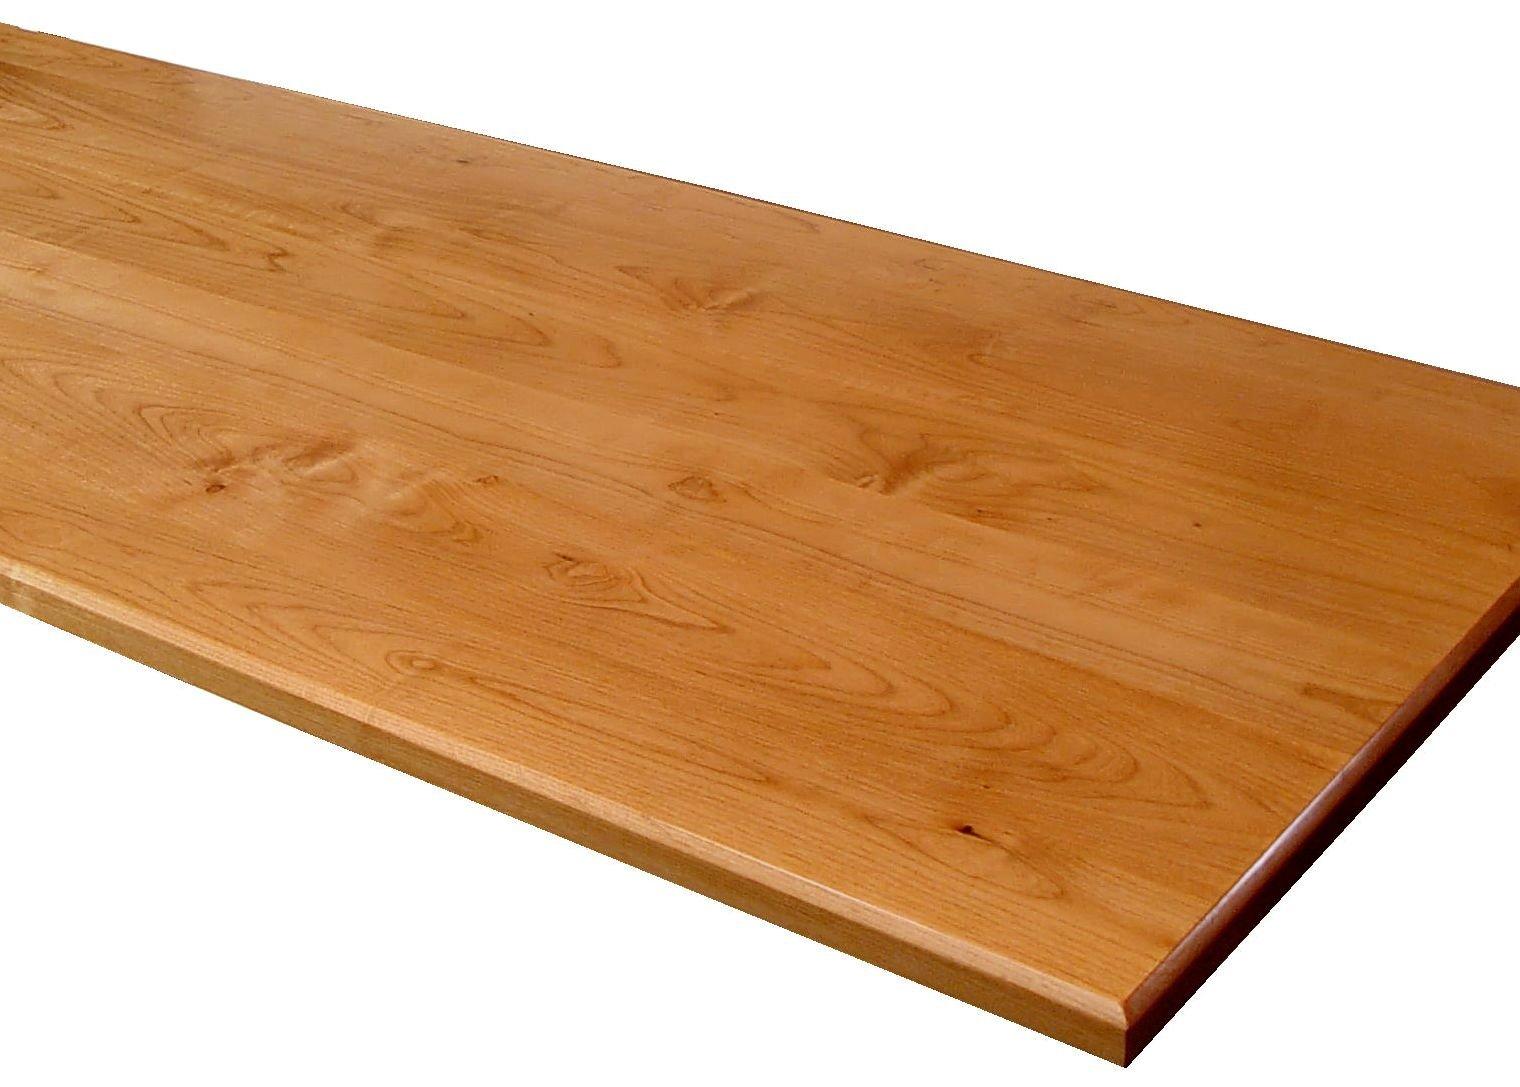 Woodworking alder wood expensive